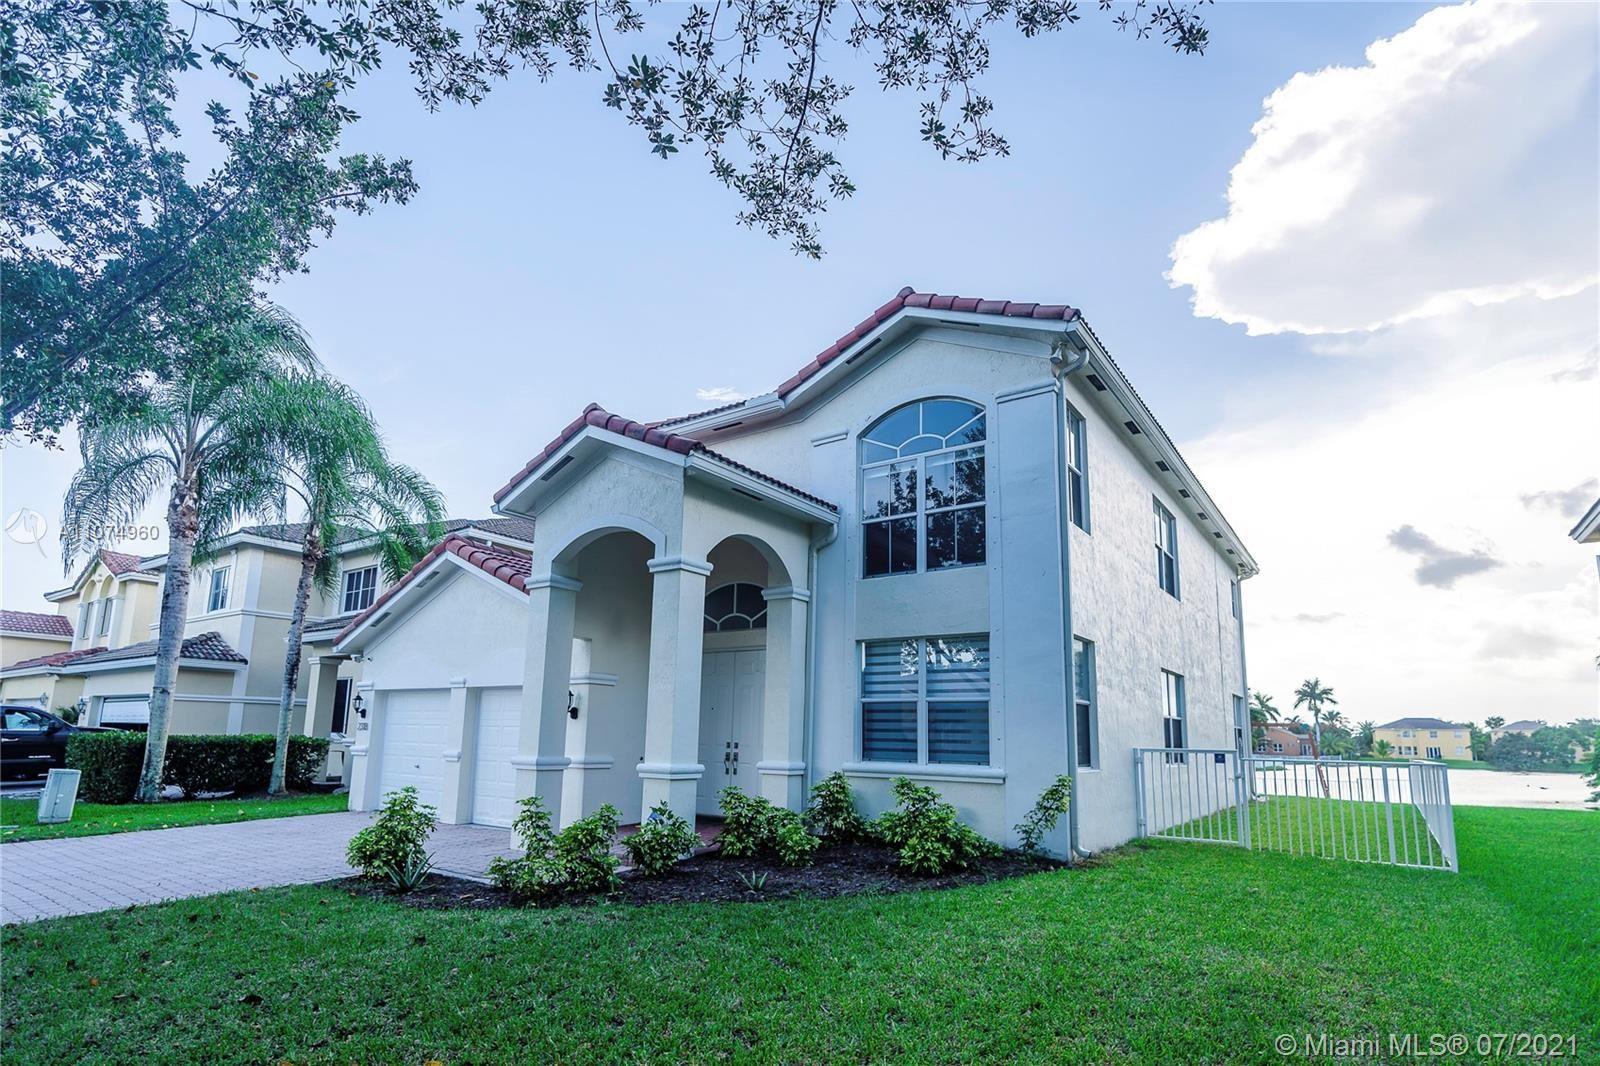 Photo of 2318 SW 127th Ave, Miramar, FL 33027 (MLS # A11074960)